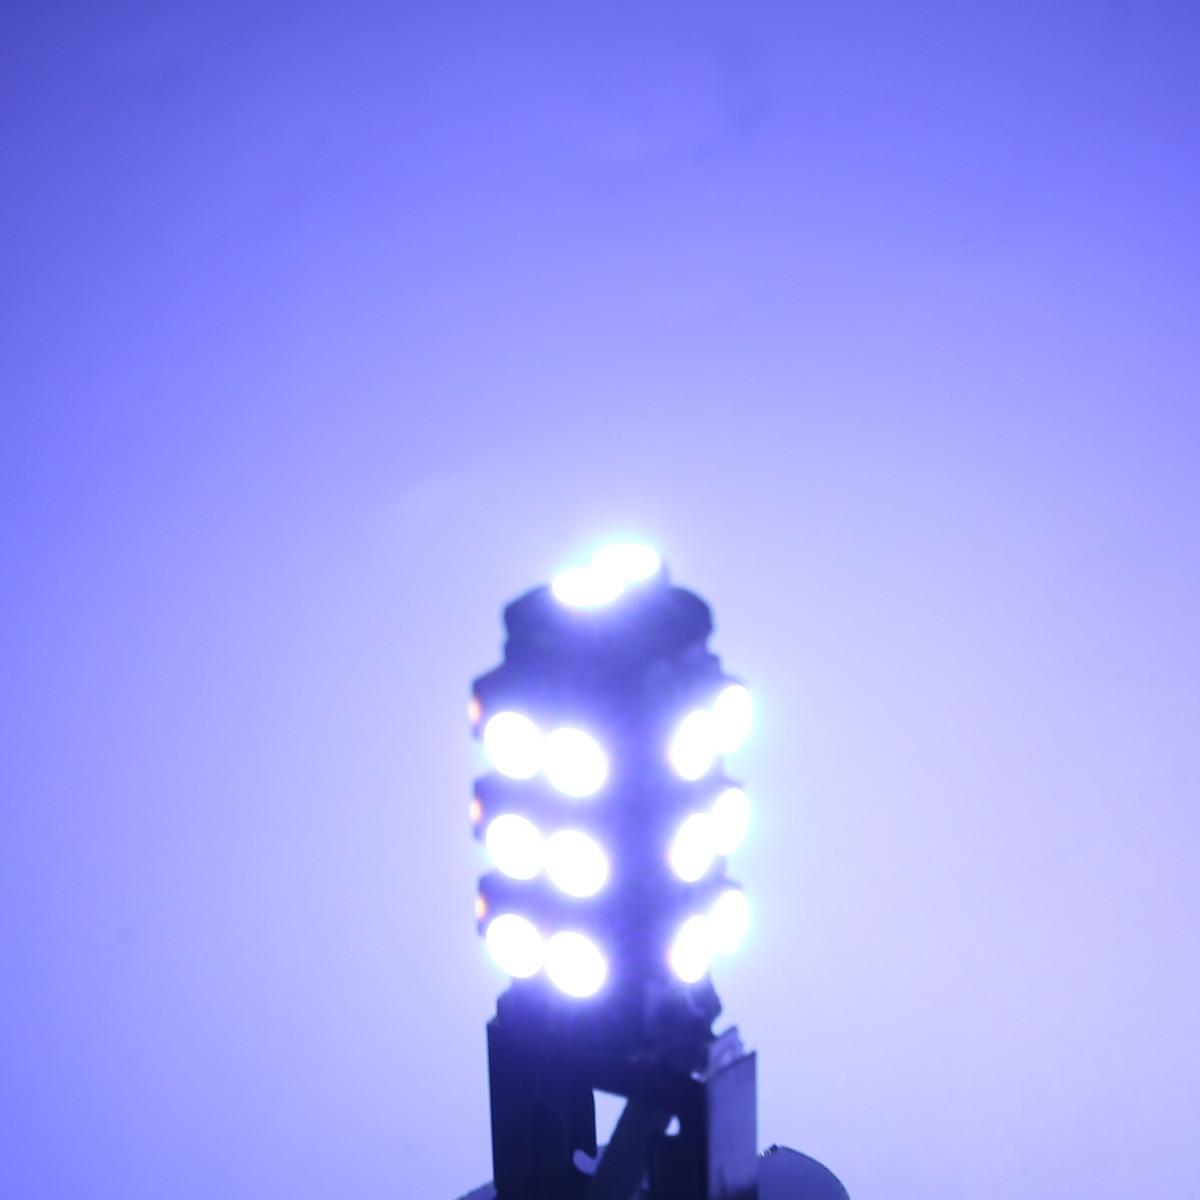 New Arrival 4pcs/set H3 2835 LED Car Fog Driving Light Lamp Bulb 6000K White 12V Car Interior Light Source